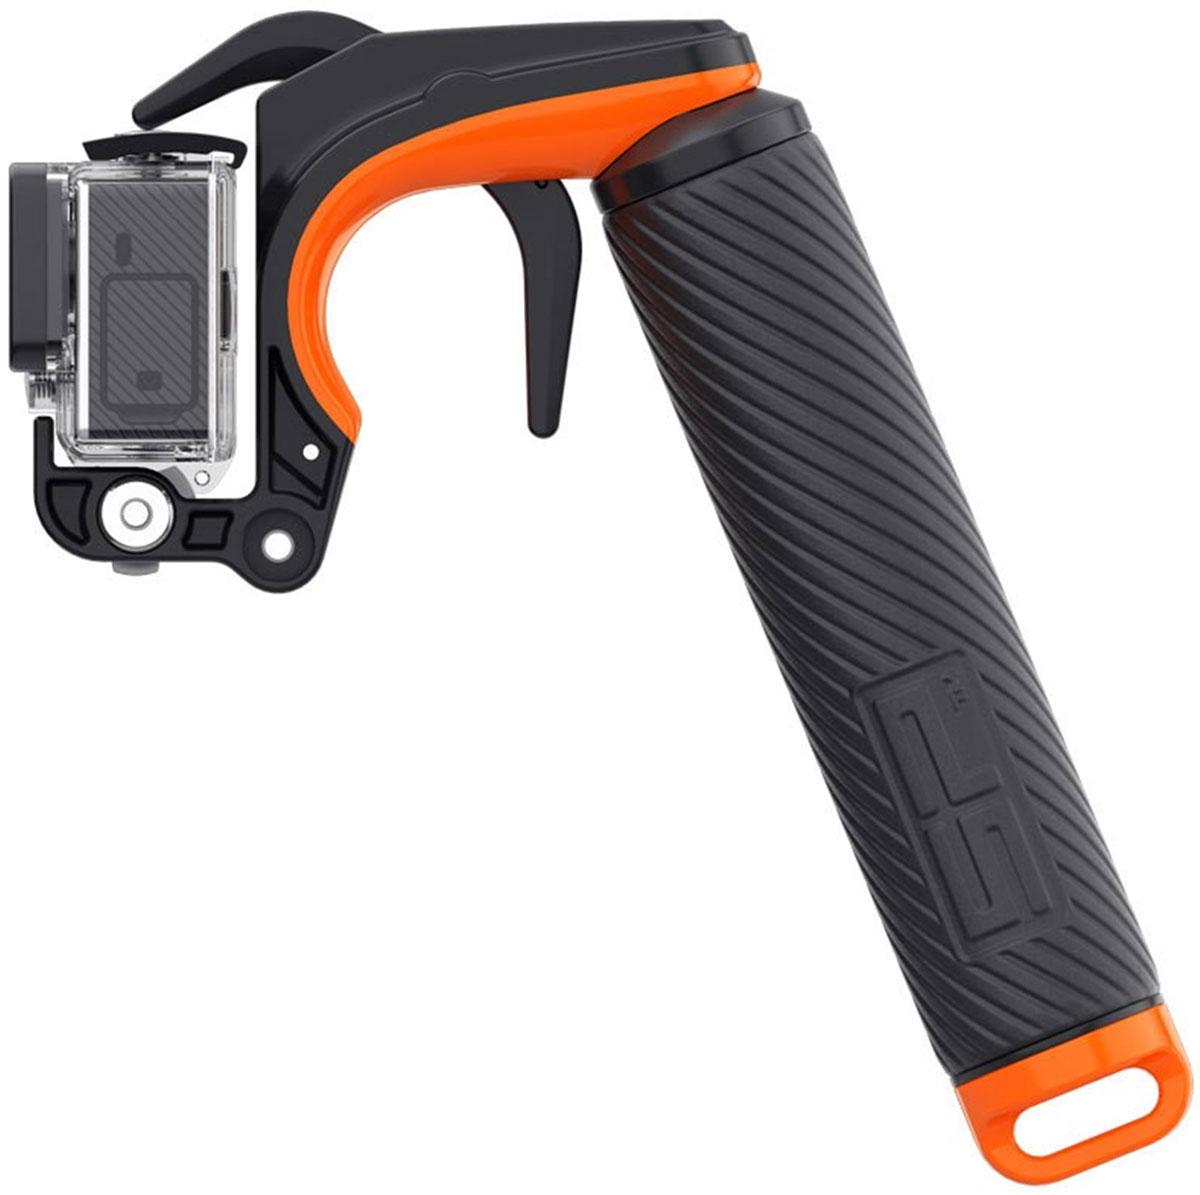 SP-Gadgets Pistol Trigger Grip Set, Black ������� ��� ����-������